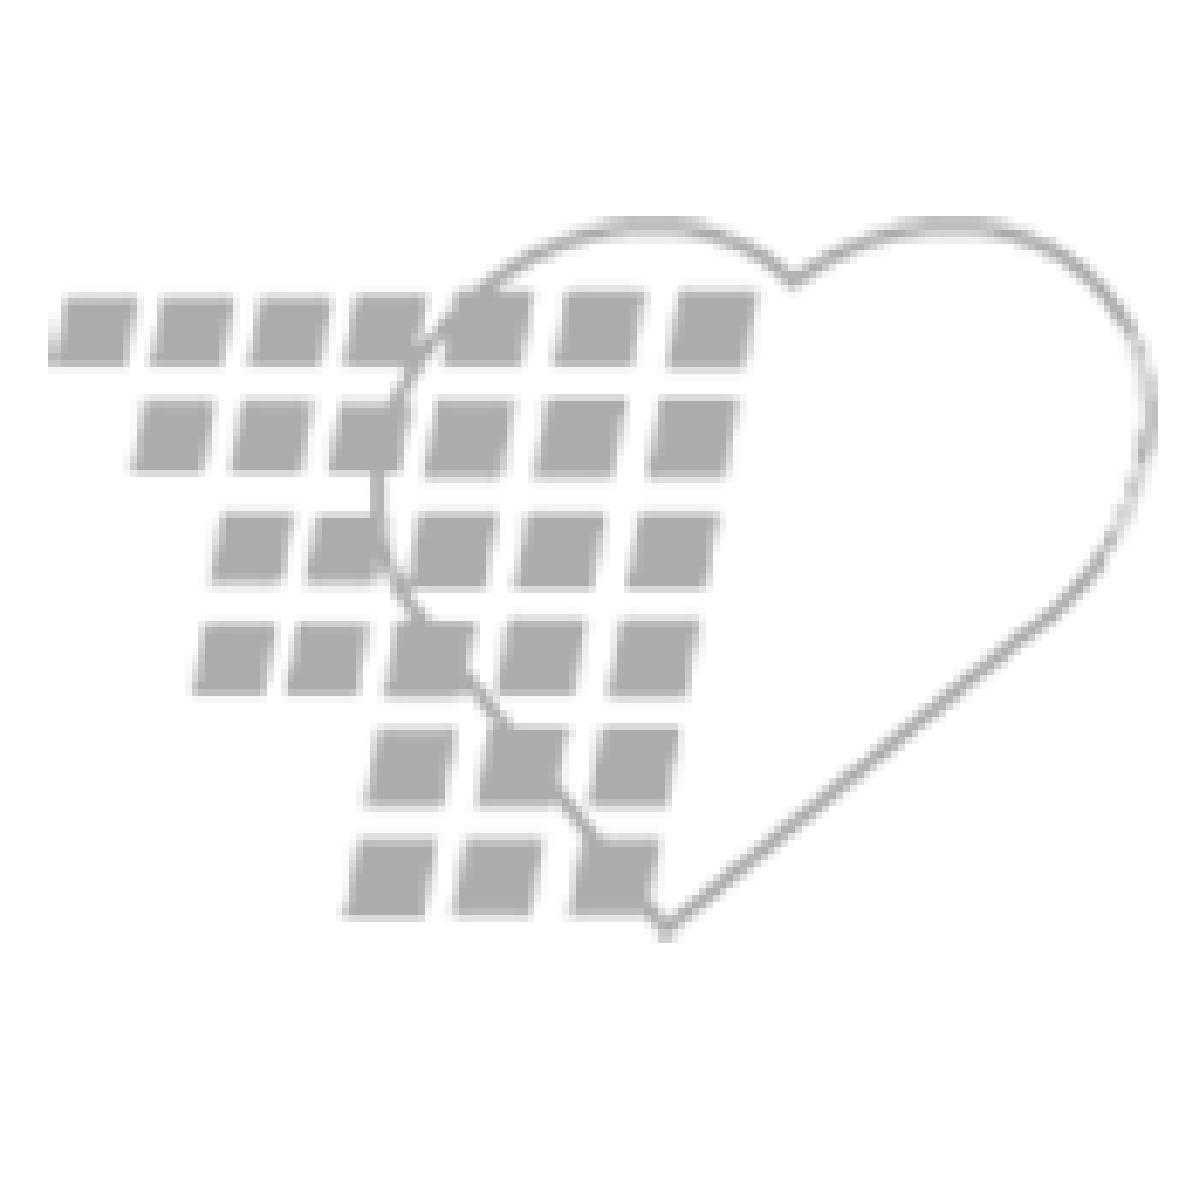 06-93-6103 Demo Dose® Simulated FFP A Rh Negative